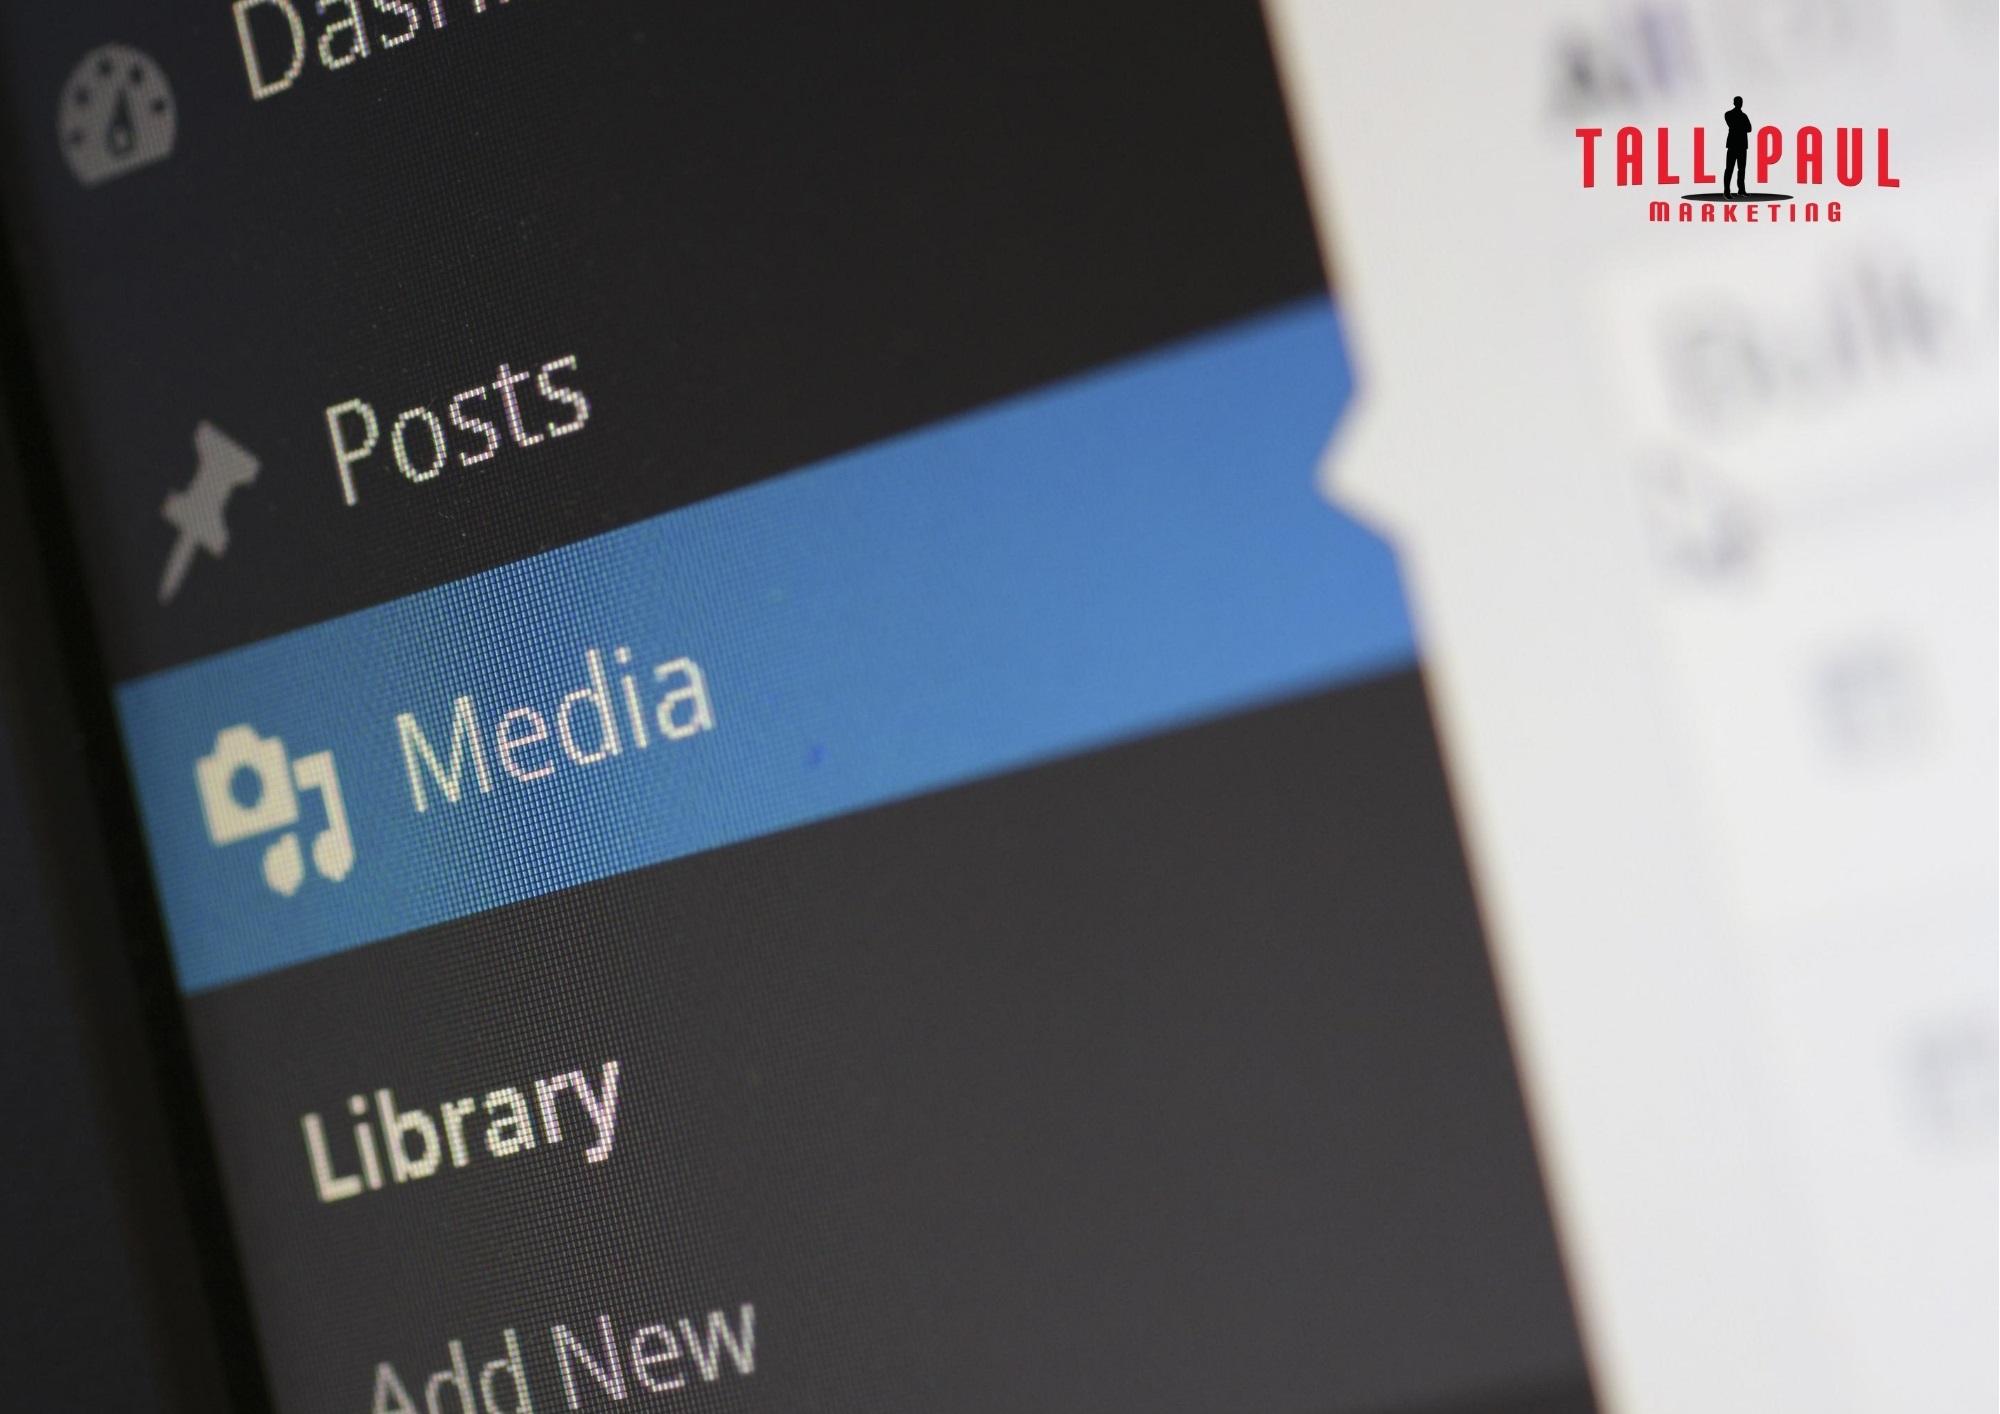 Business 2020 blog benefits - Tall Paul Marketing - Northern Ireland Freelance Copywriter Paul Malone